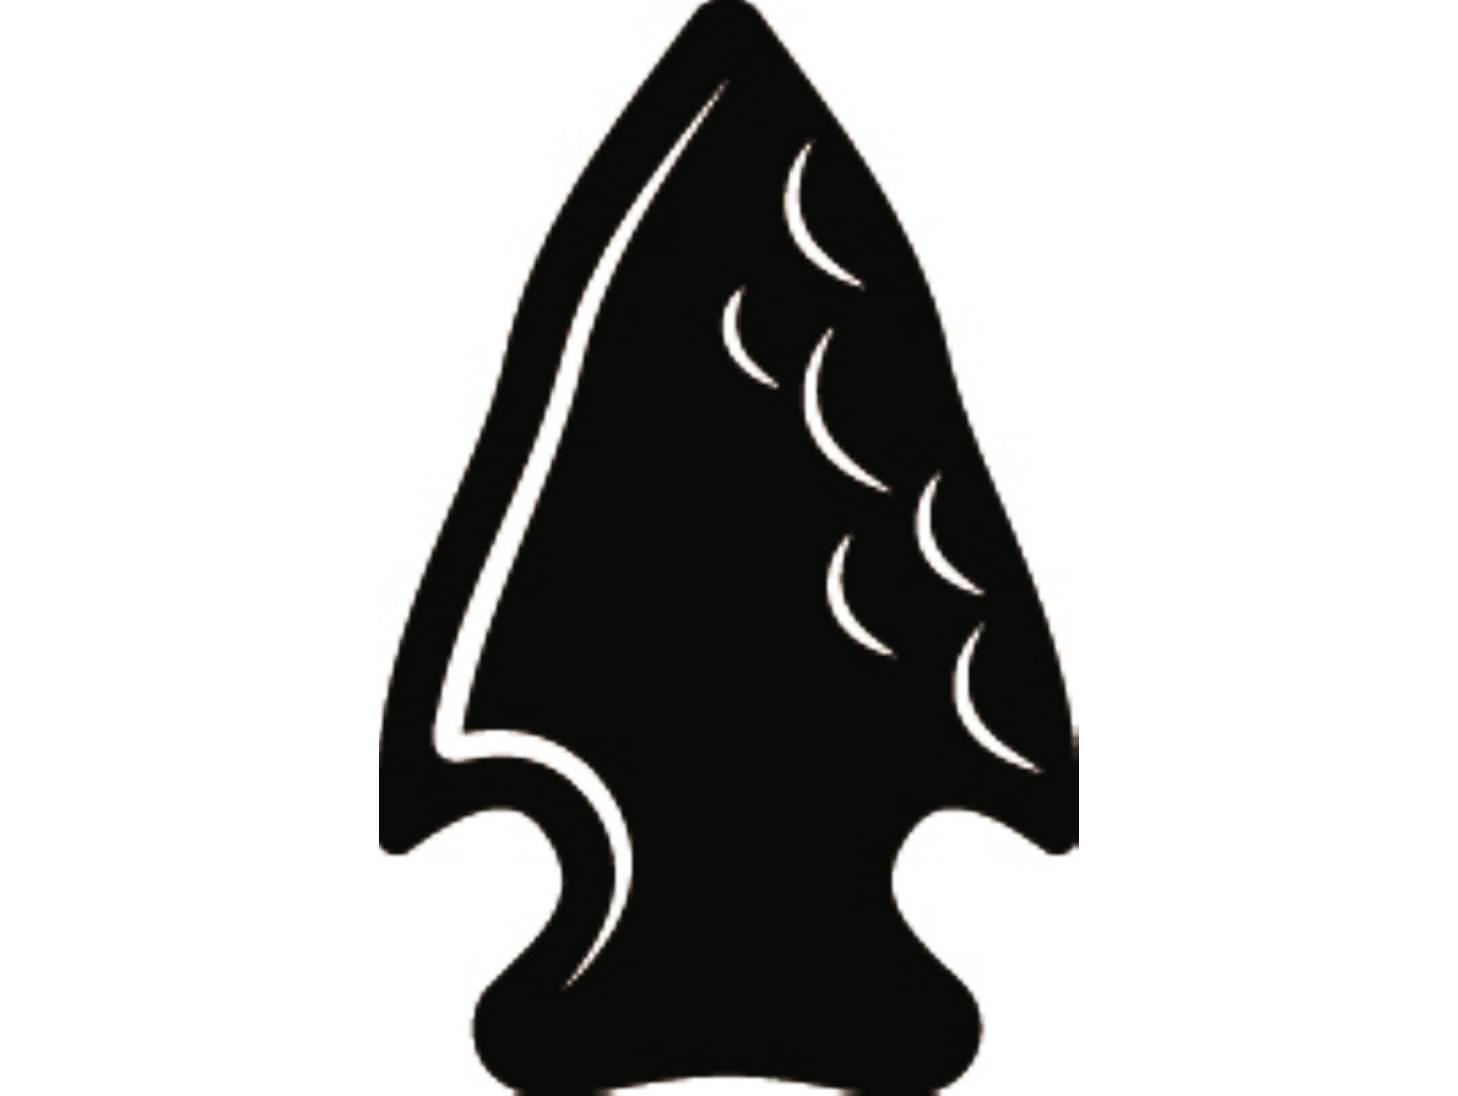 Arrowhead clipart, Picture #186646 arrowhead clipart.